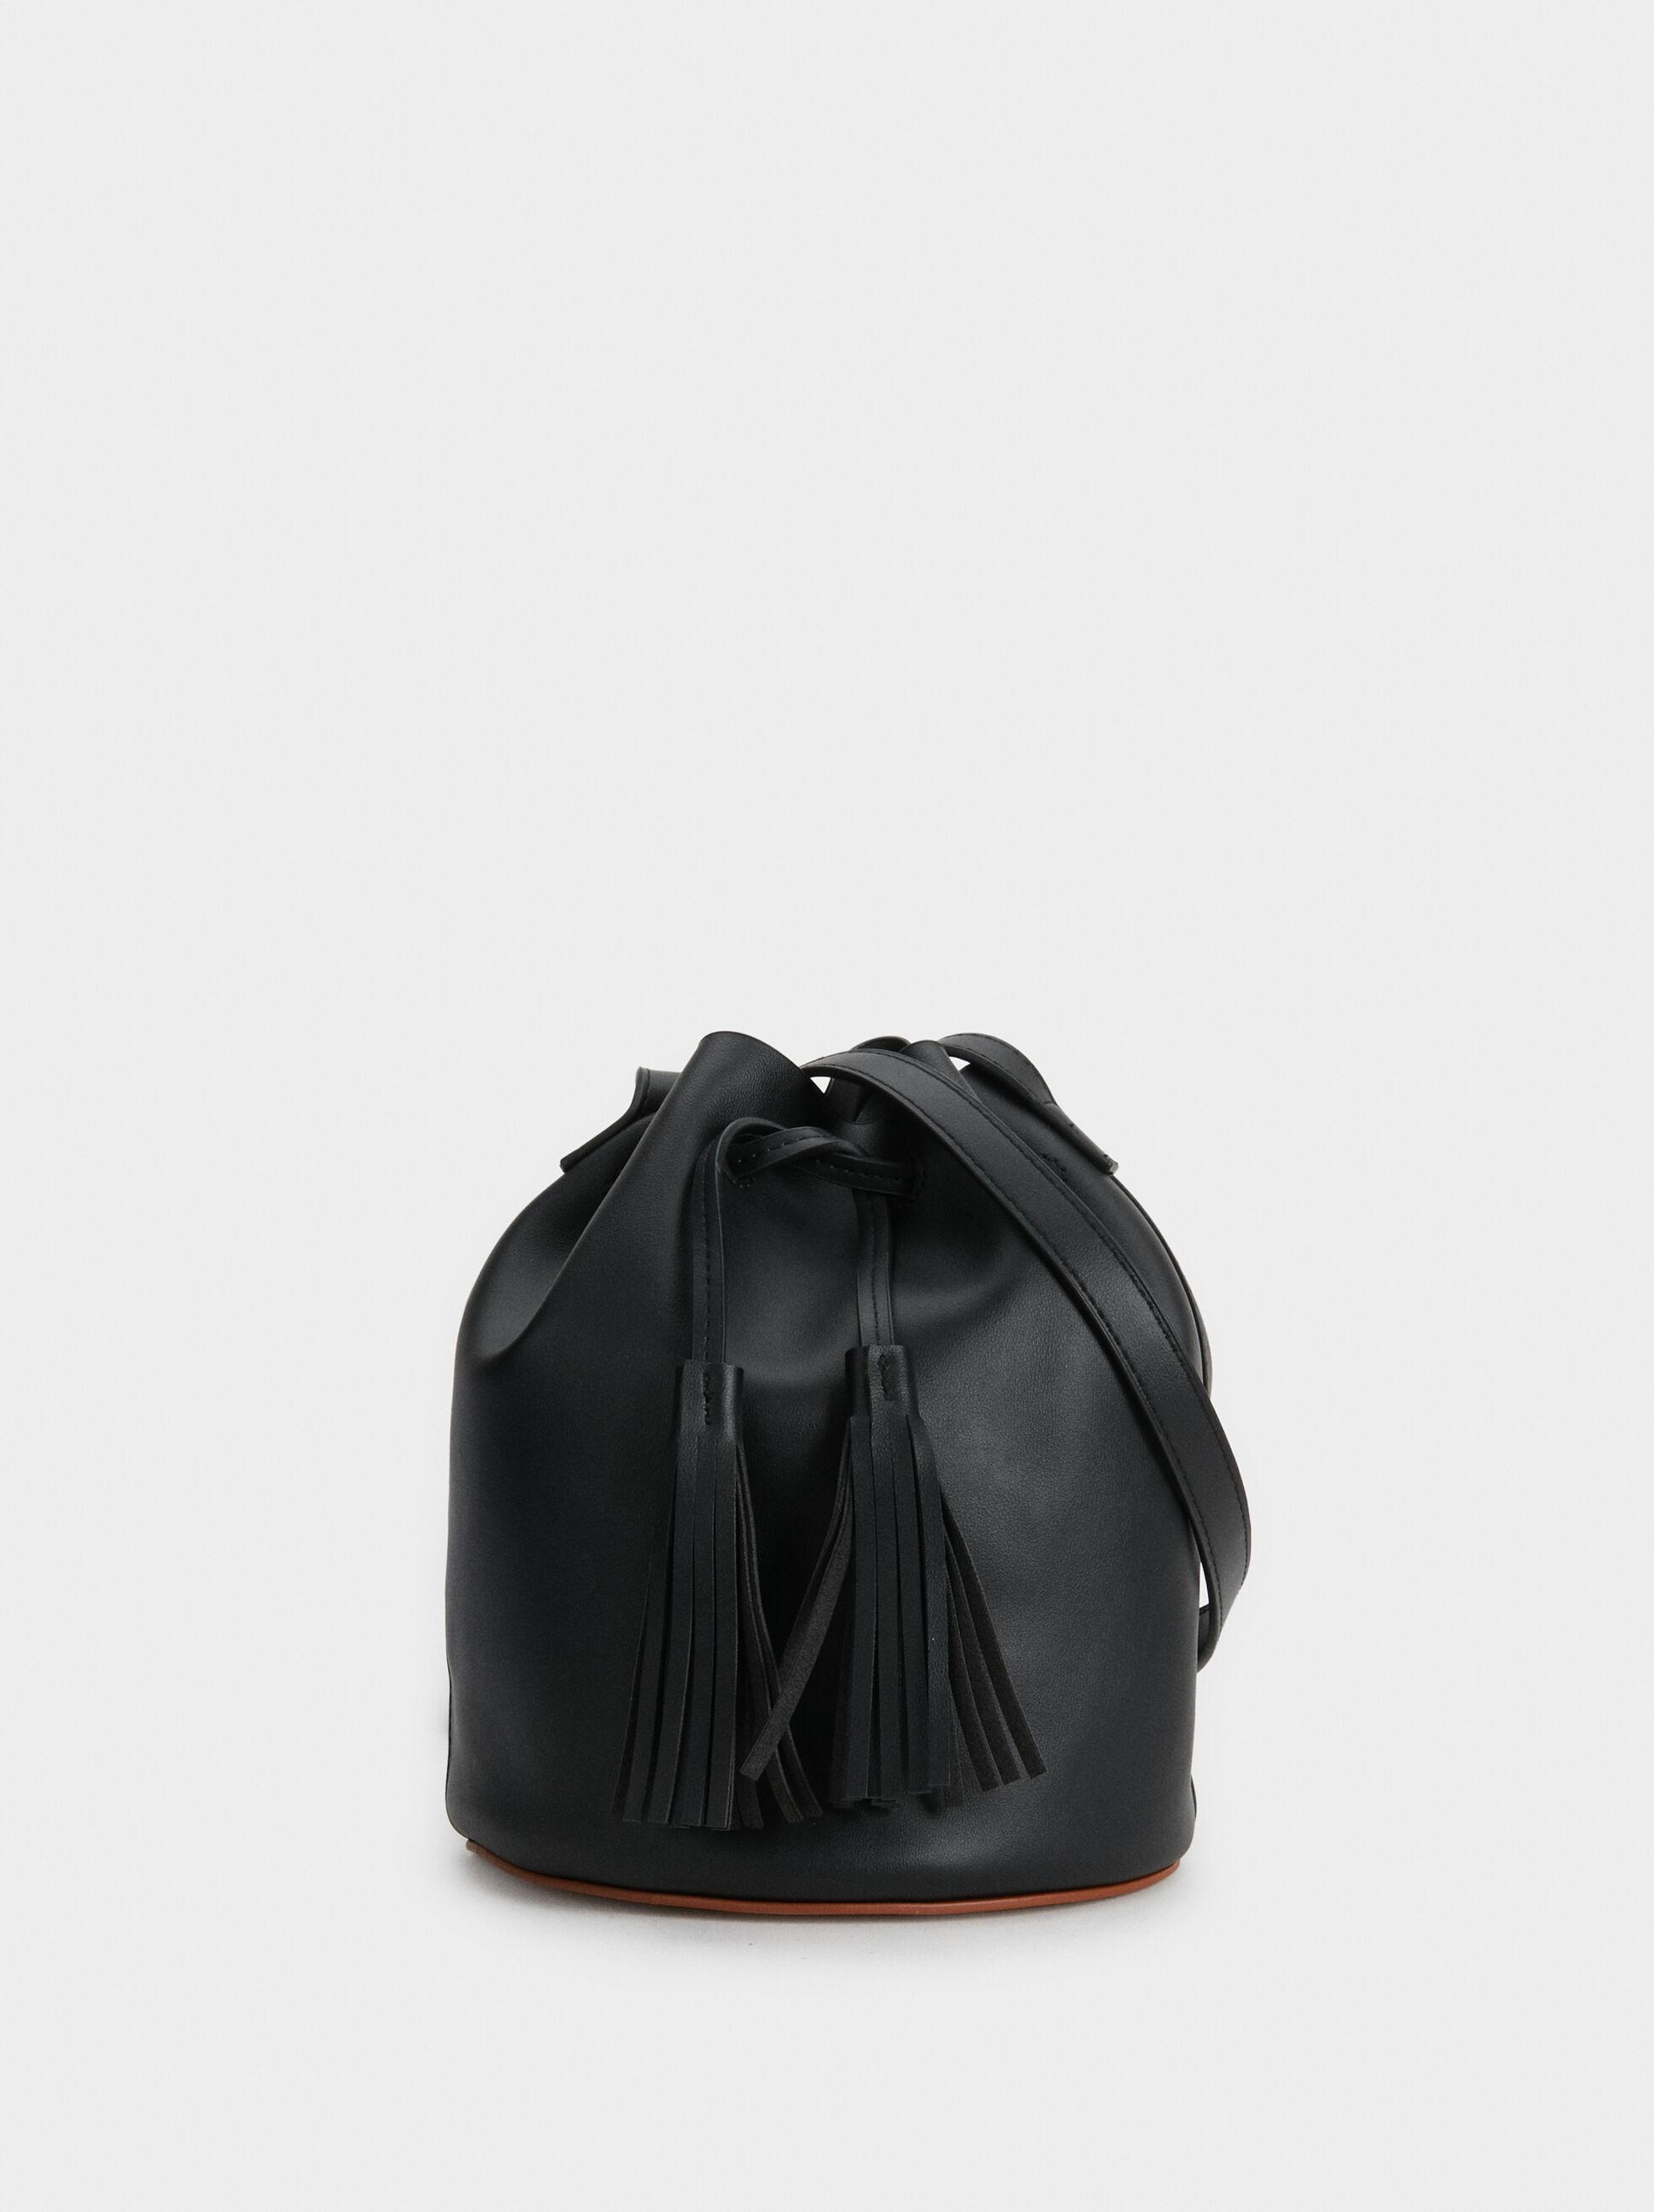 Bucket Bag With Tassels, , hi-res